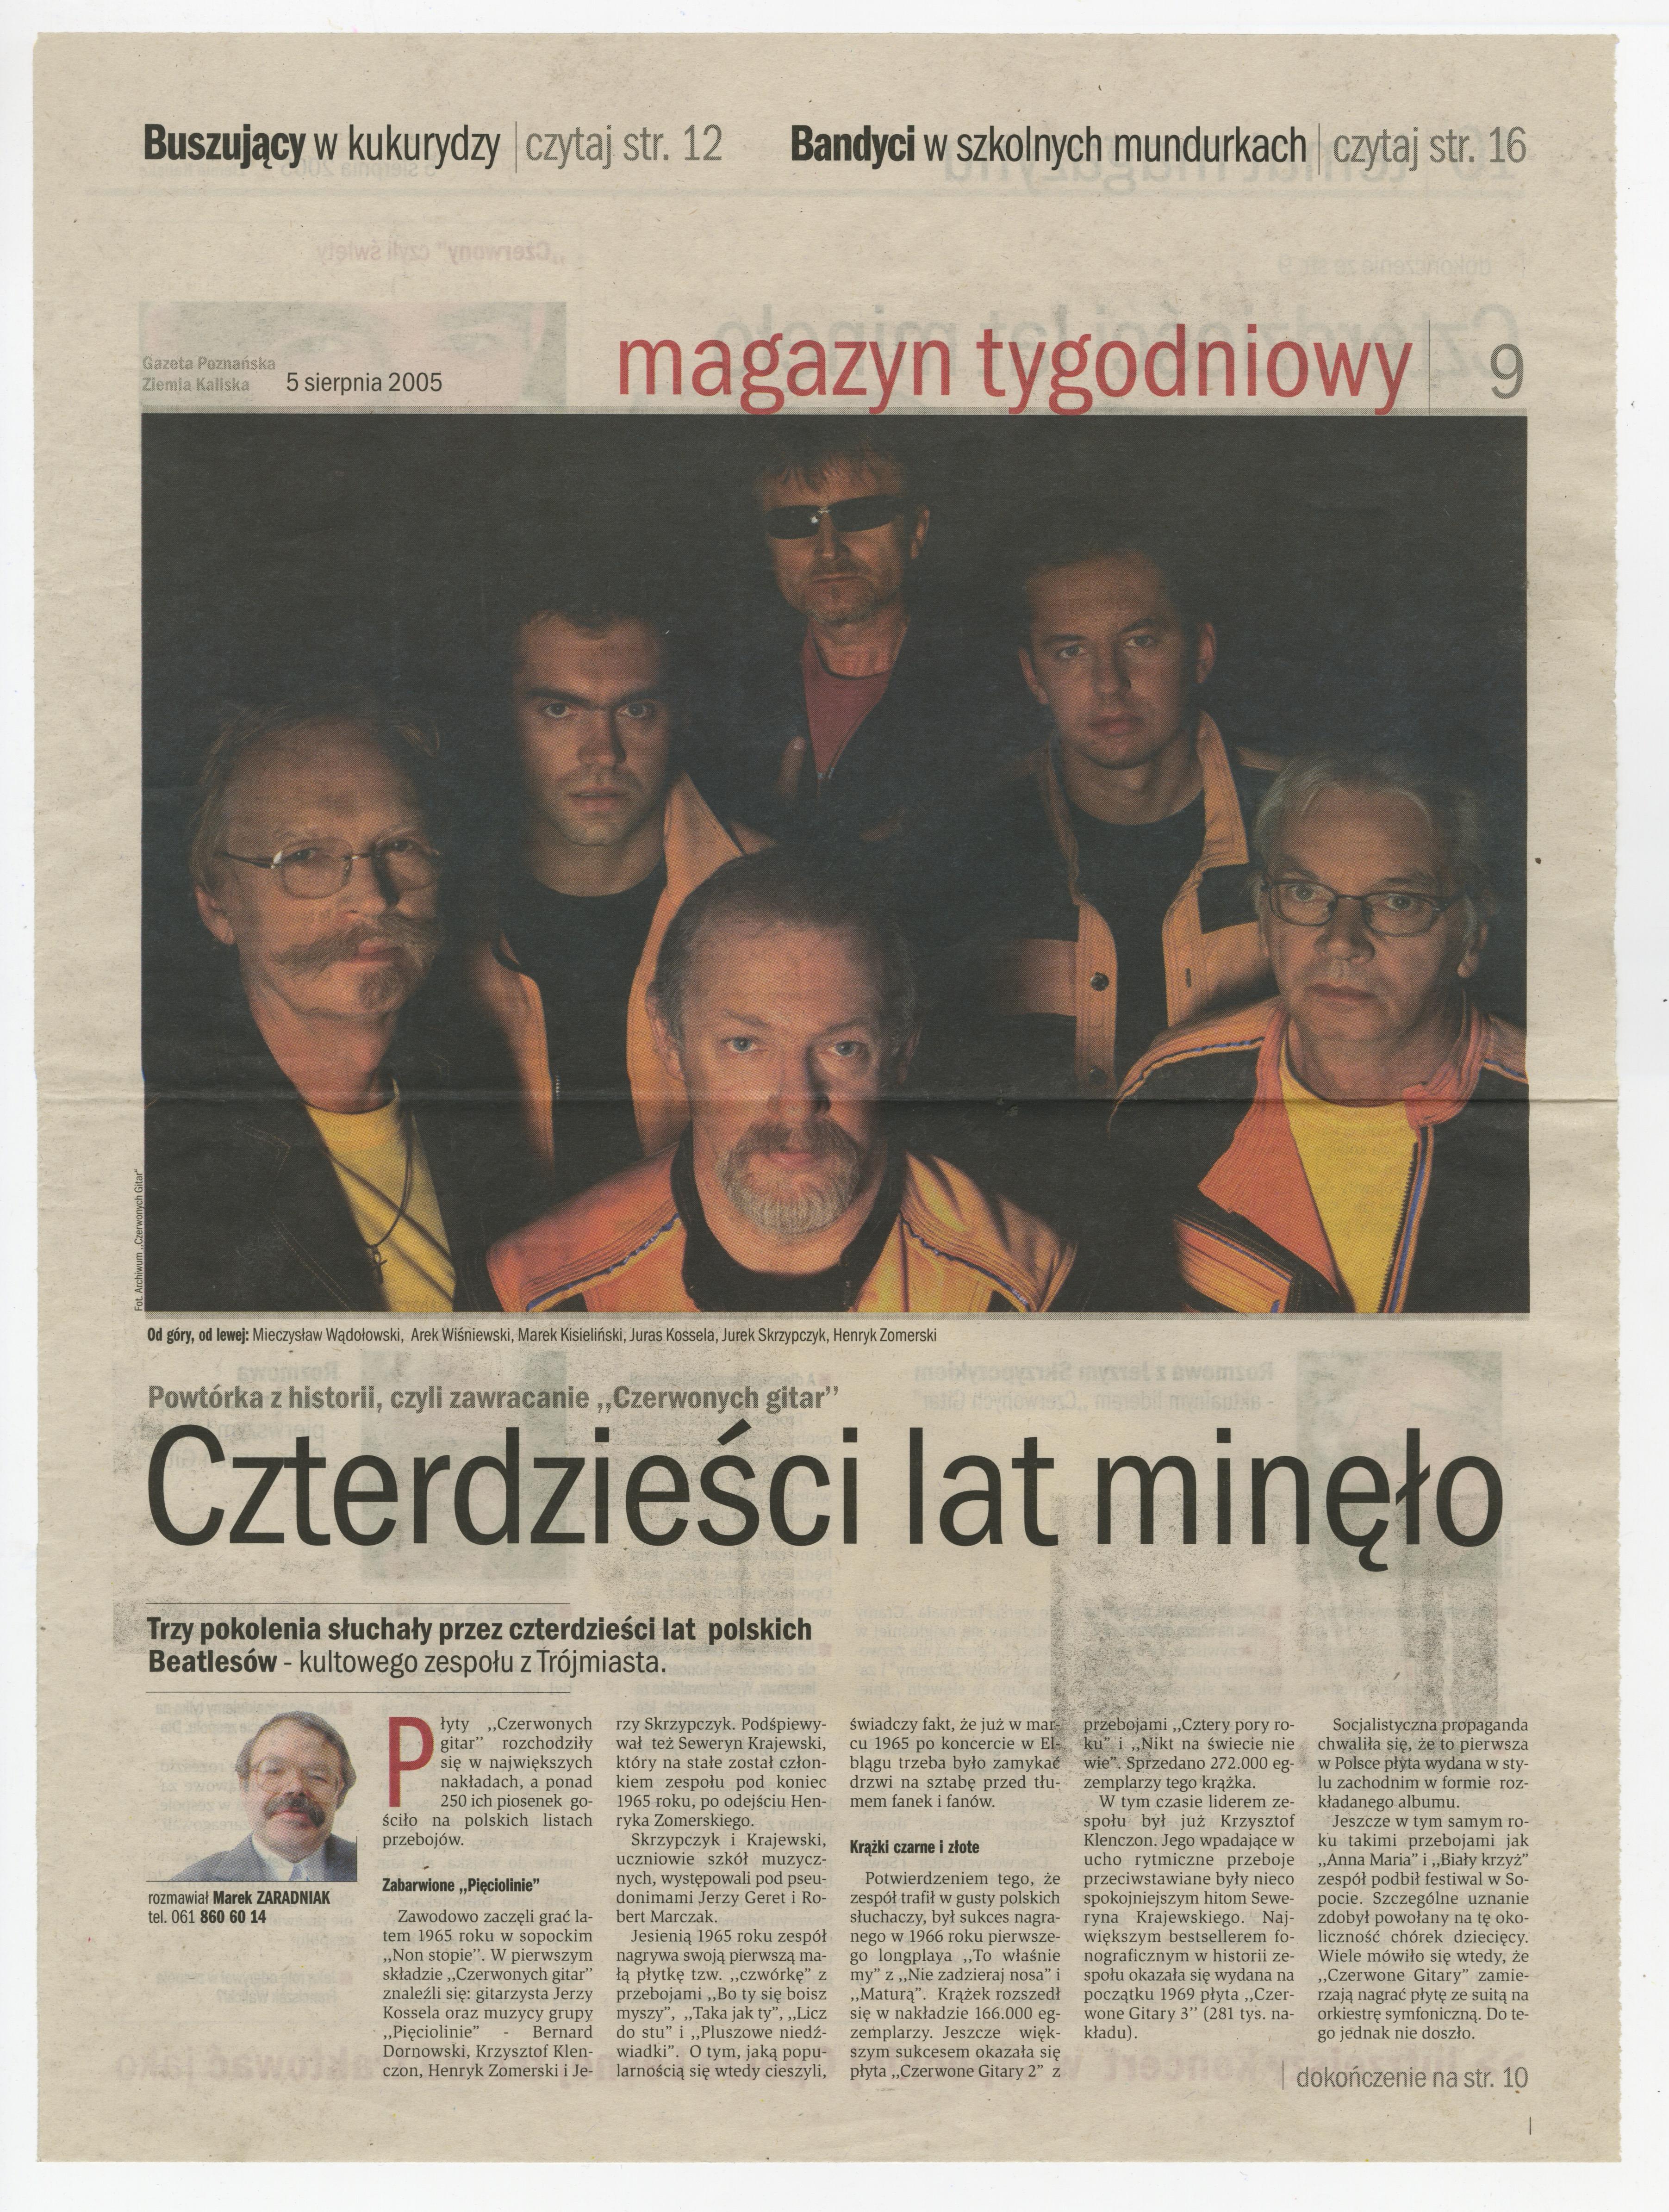 2004-2012-Gazeta_Poznanska_2005_40lat_Czg_Minelo_02